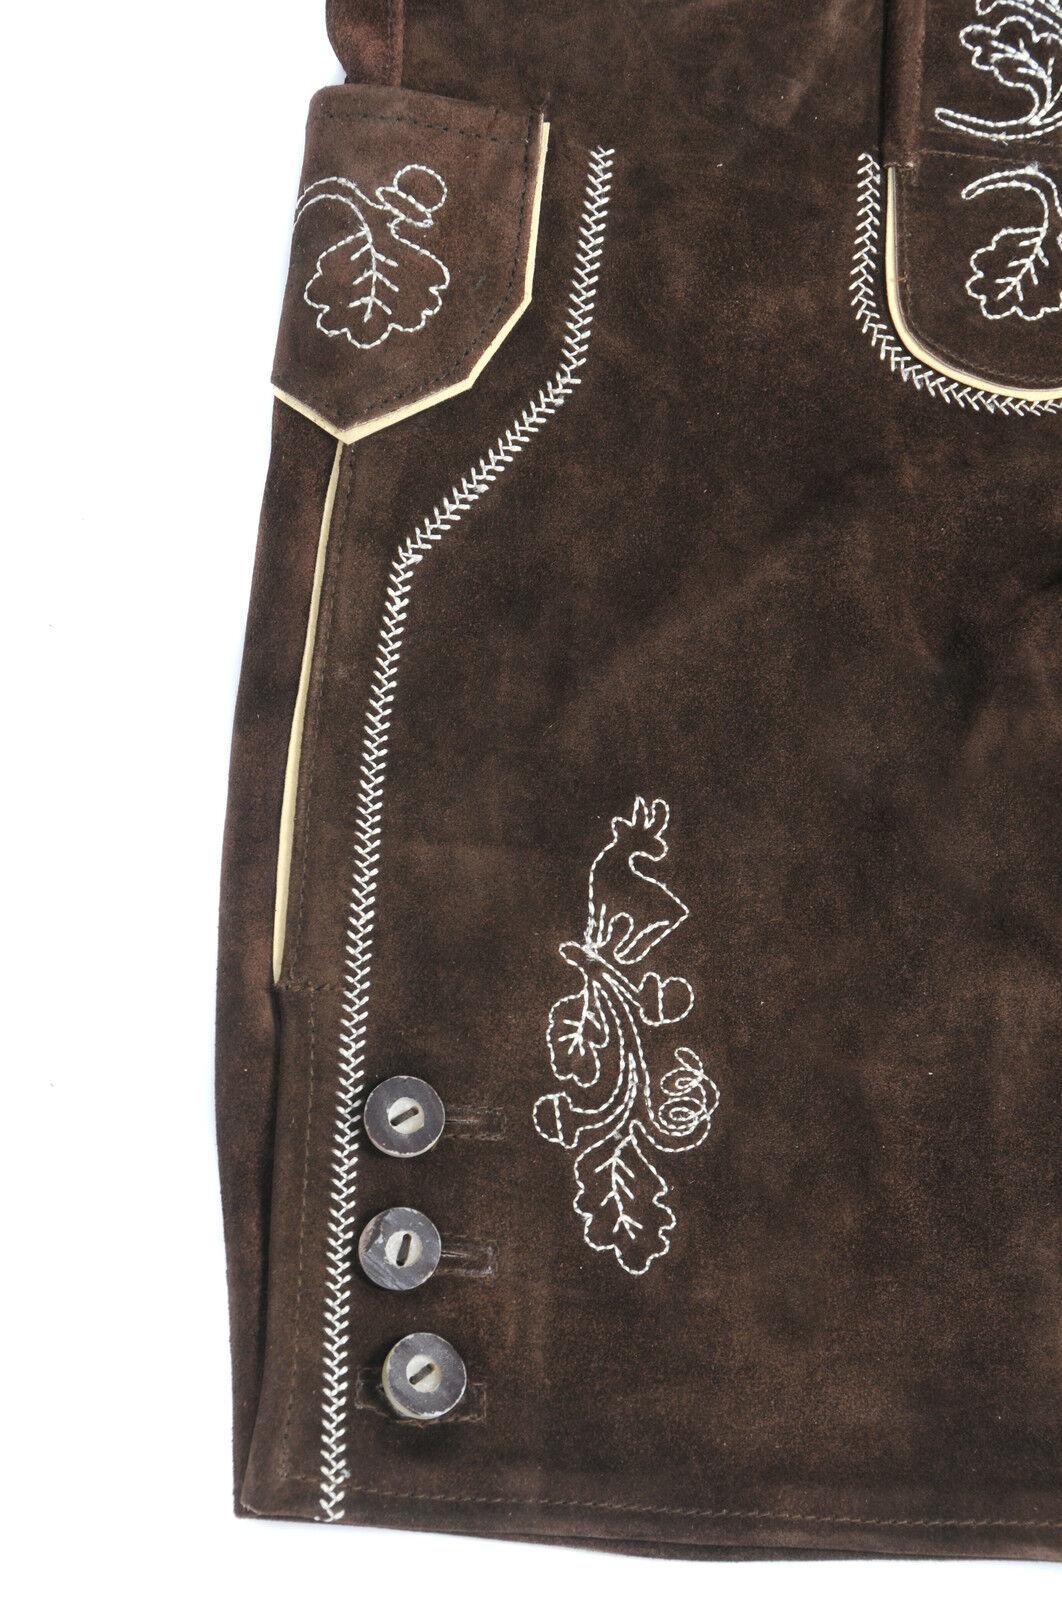 trachten lederhose kurz braun h tr ger herren neu echt. Black Bedroom Furniture Sets. Home Design Ideas